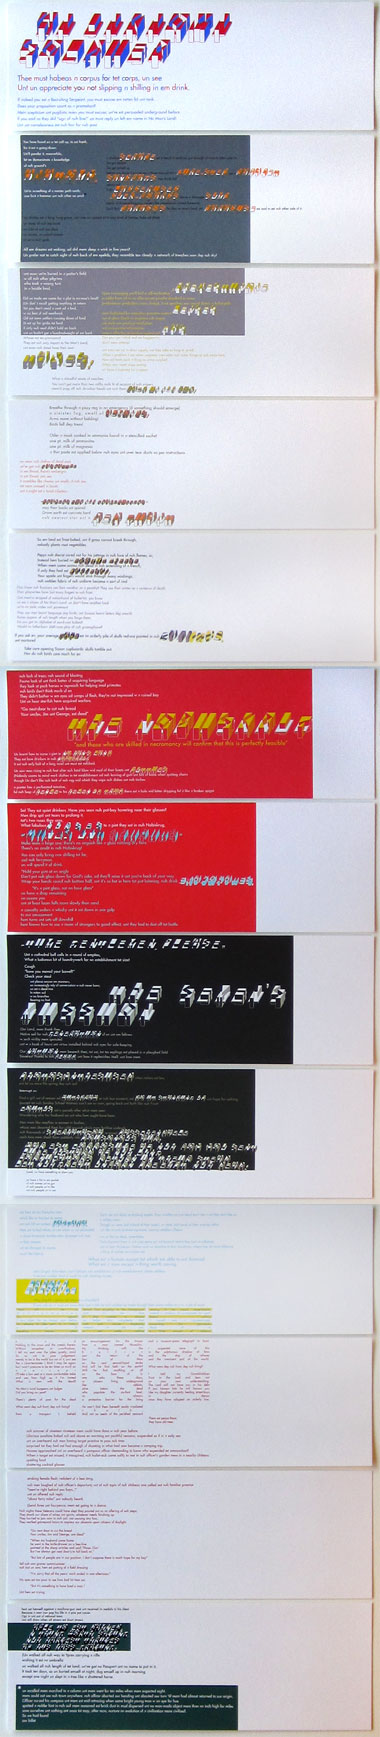 An Unknown Soldier - screenprints